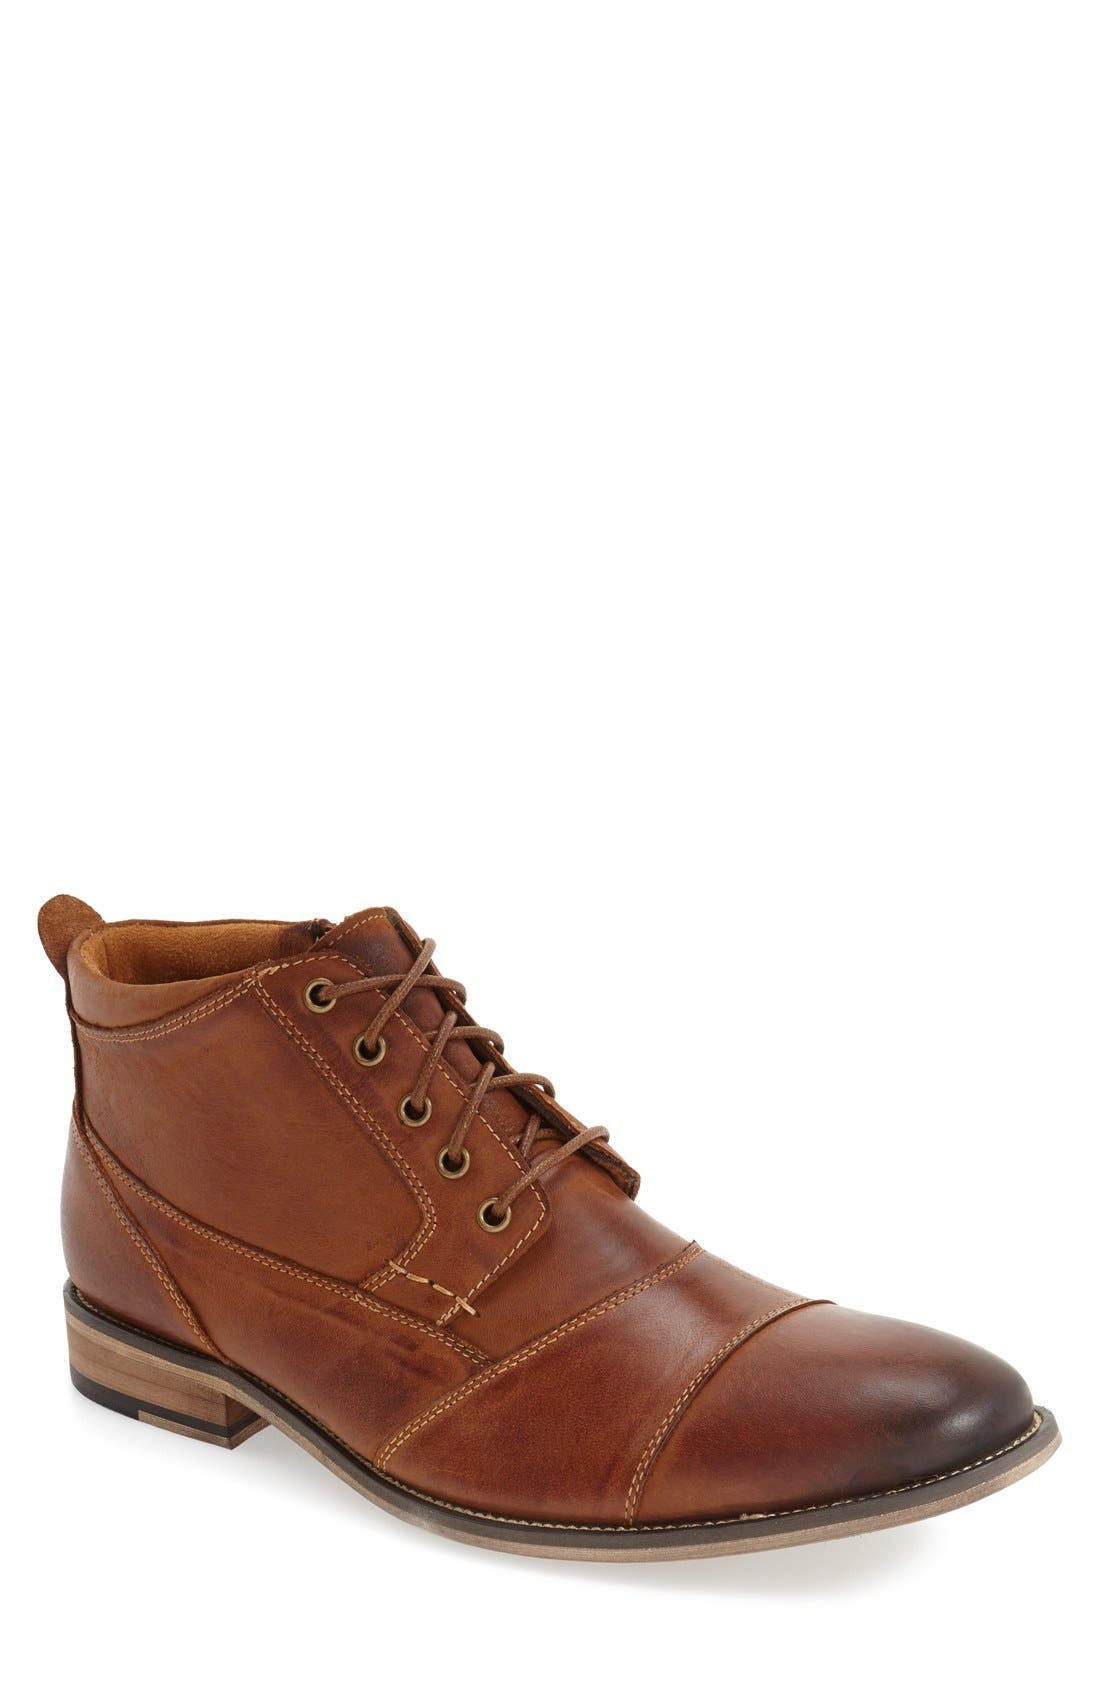 'Jabbar' Cap Toe Boot,                         Main,                         color, DARK TAN LEATHER